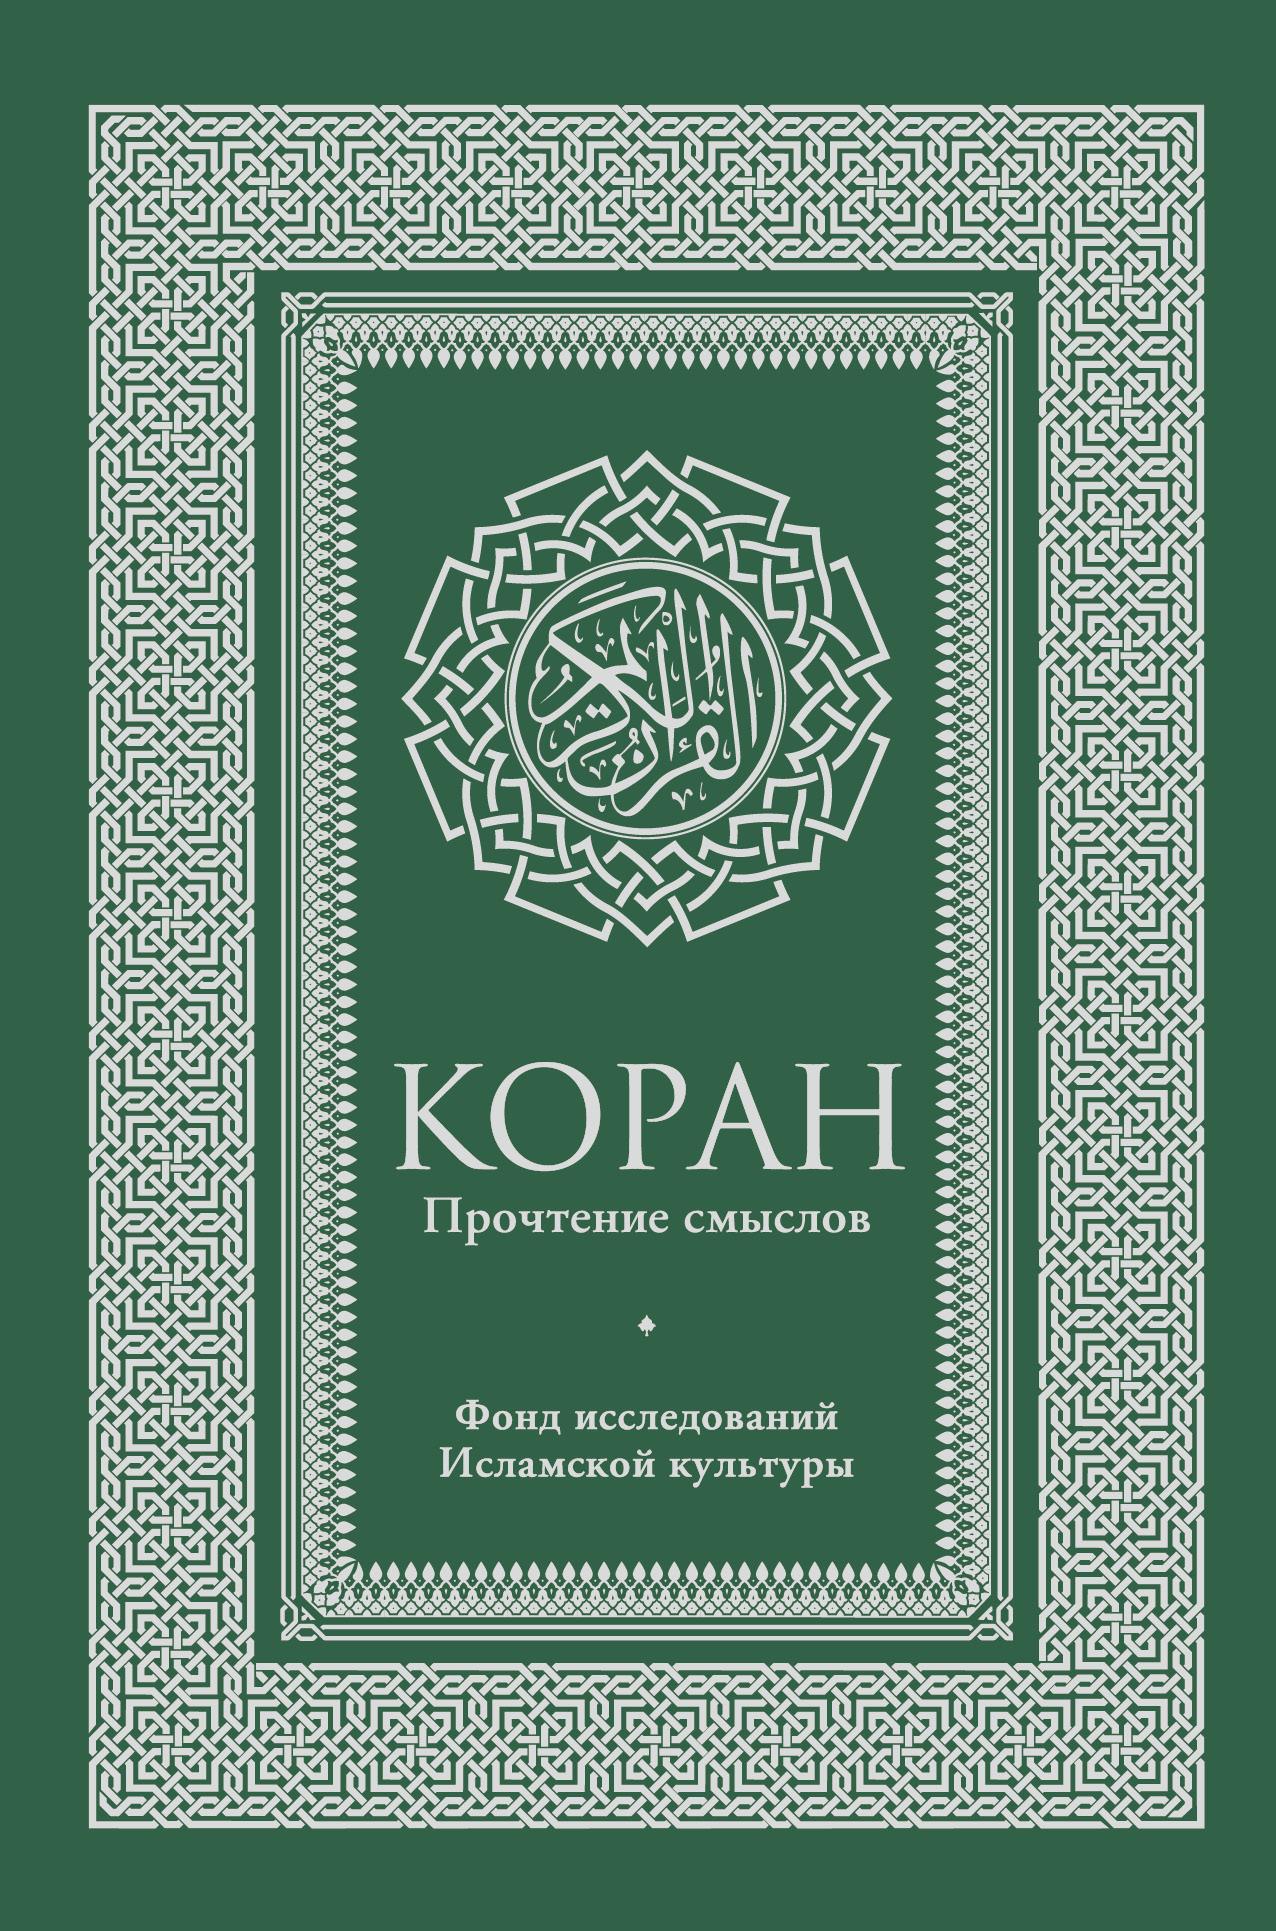 Фонд исследований исламской культуры Коран. Прочтение смыслов. Фонд исследований исламской культуры театр нур билеты уфа